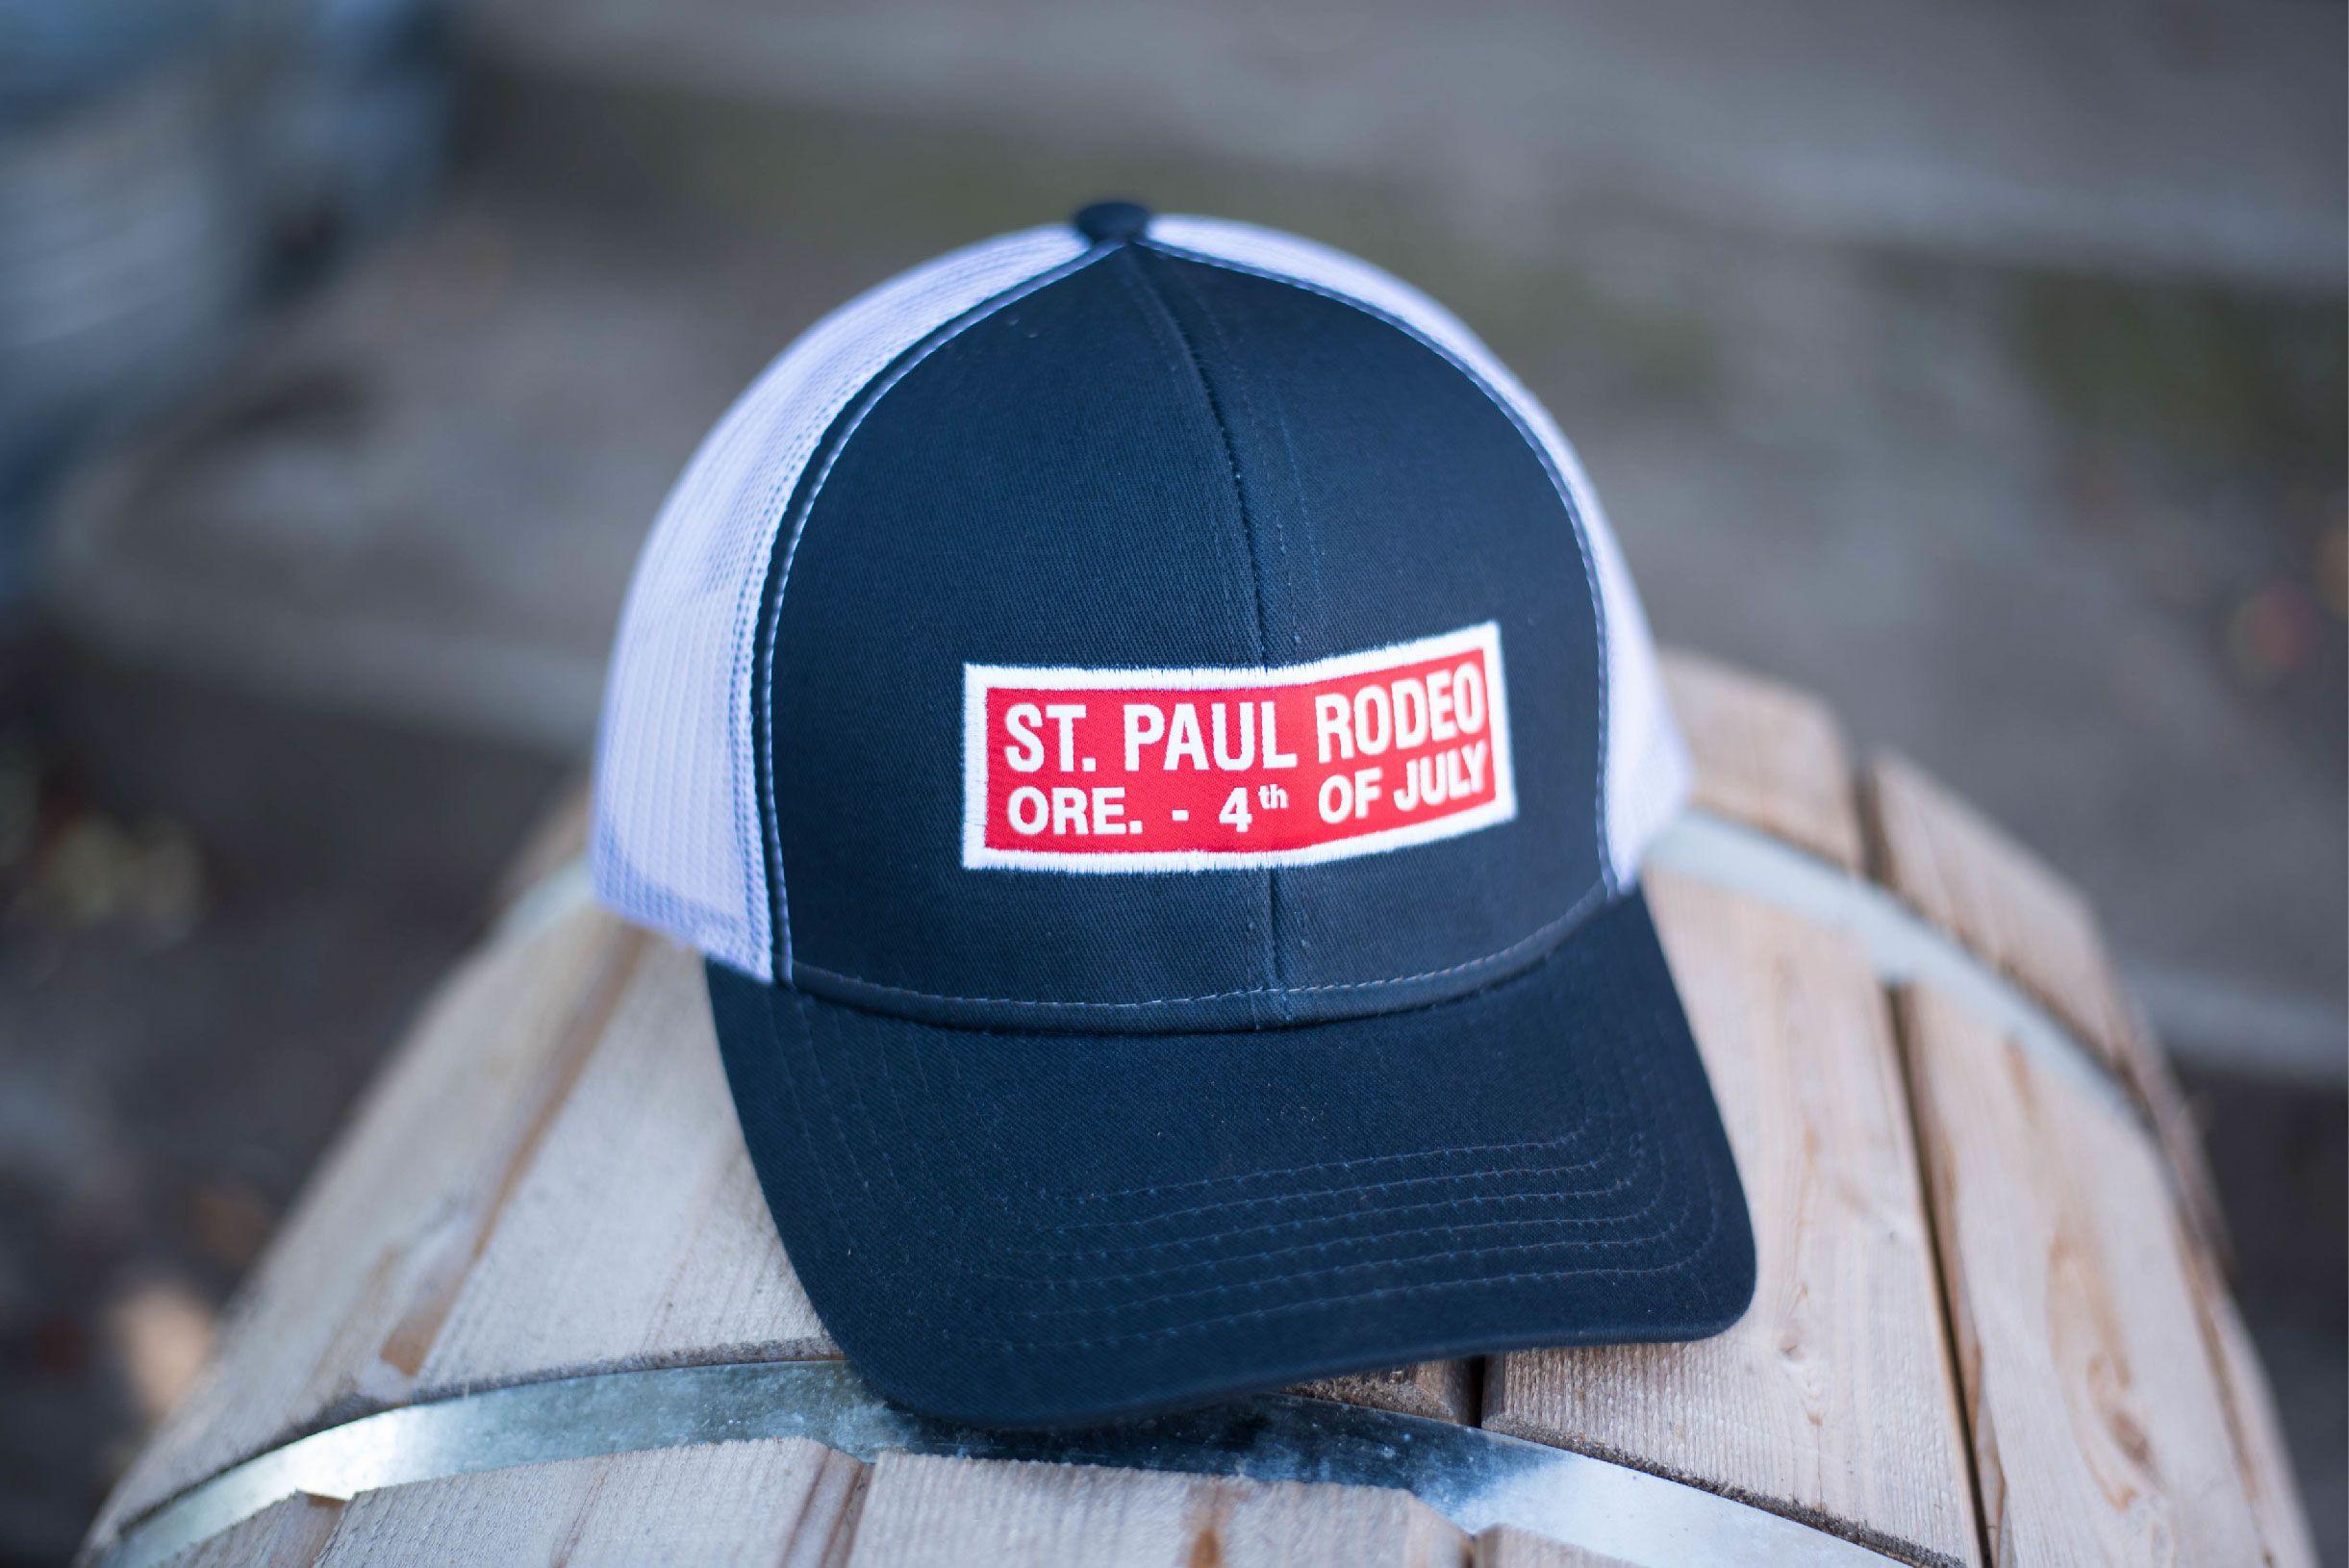 3858e442ae9cb 2017 Bumper Sticker SPR cap. Our most popular souvenir item. Pick up at the  2018 St. Paul Rodeo - July 3 thru 7